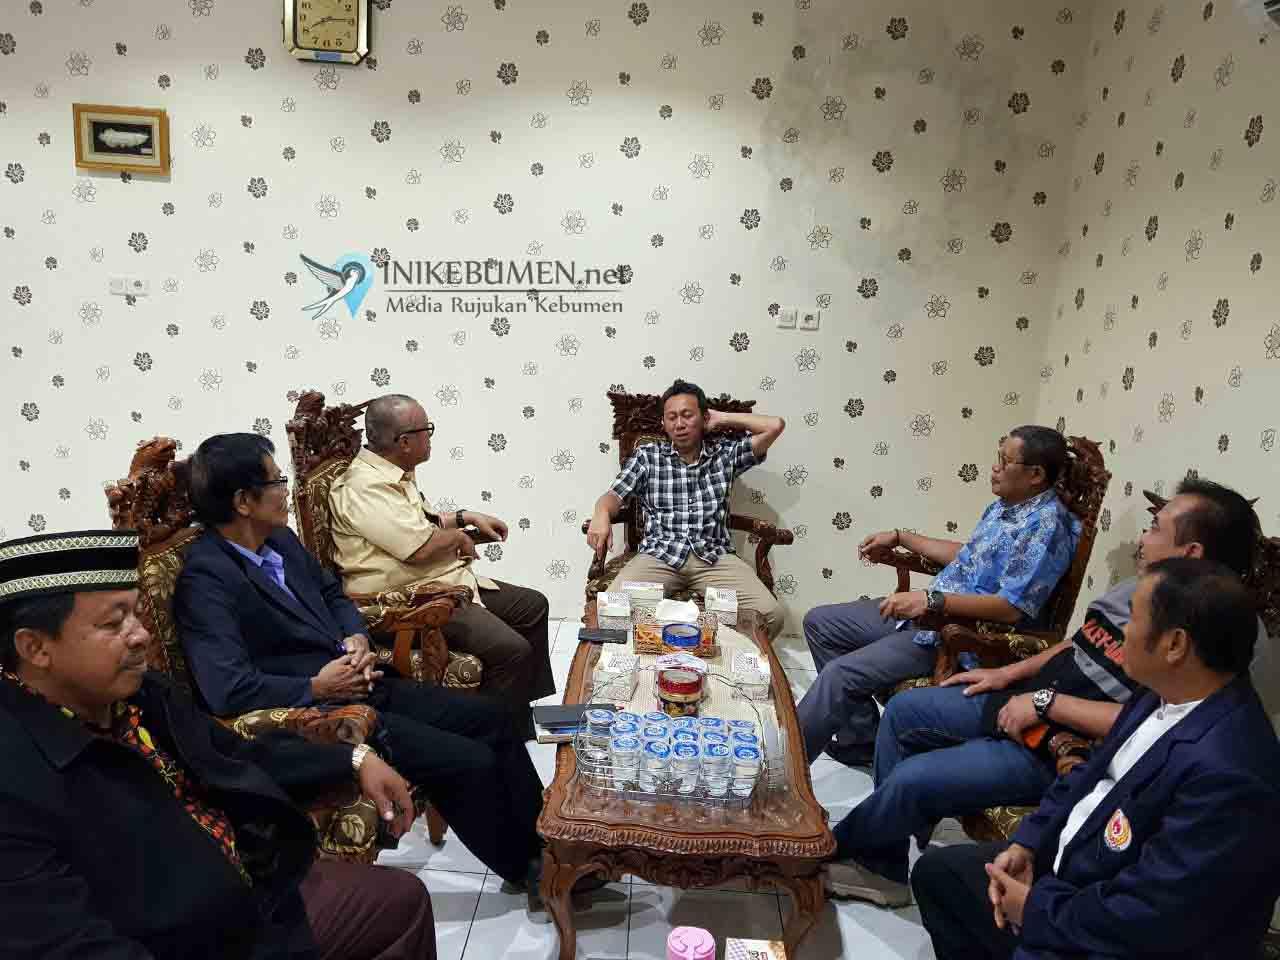 Azam Fatoni: KONI Tak Pernah Usulkan Anggaran Pra Porprov Lewat Disporawisata Kebumen